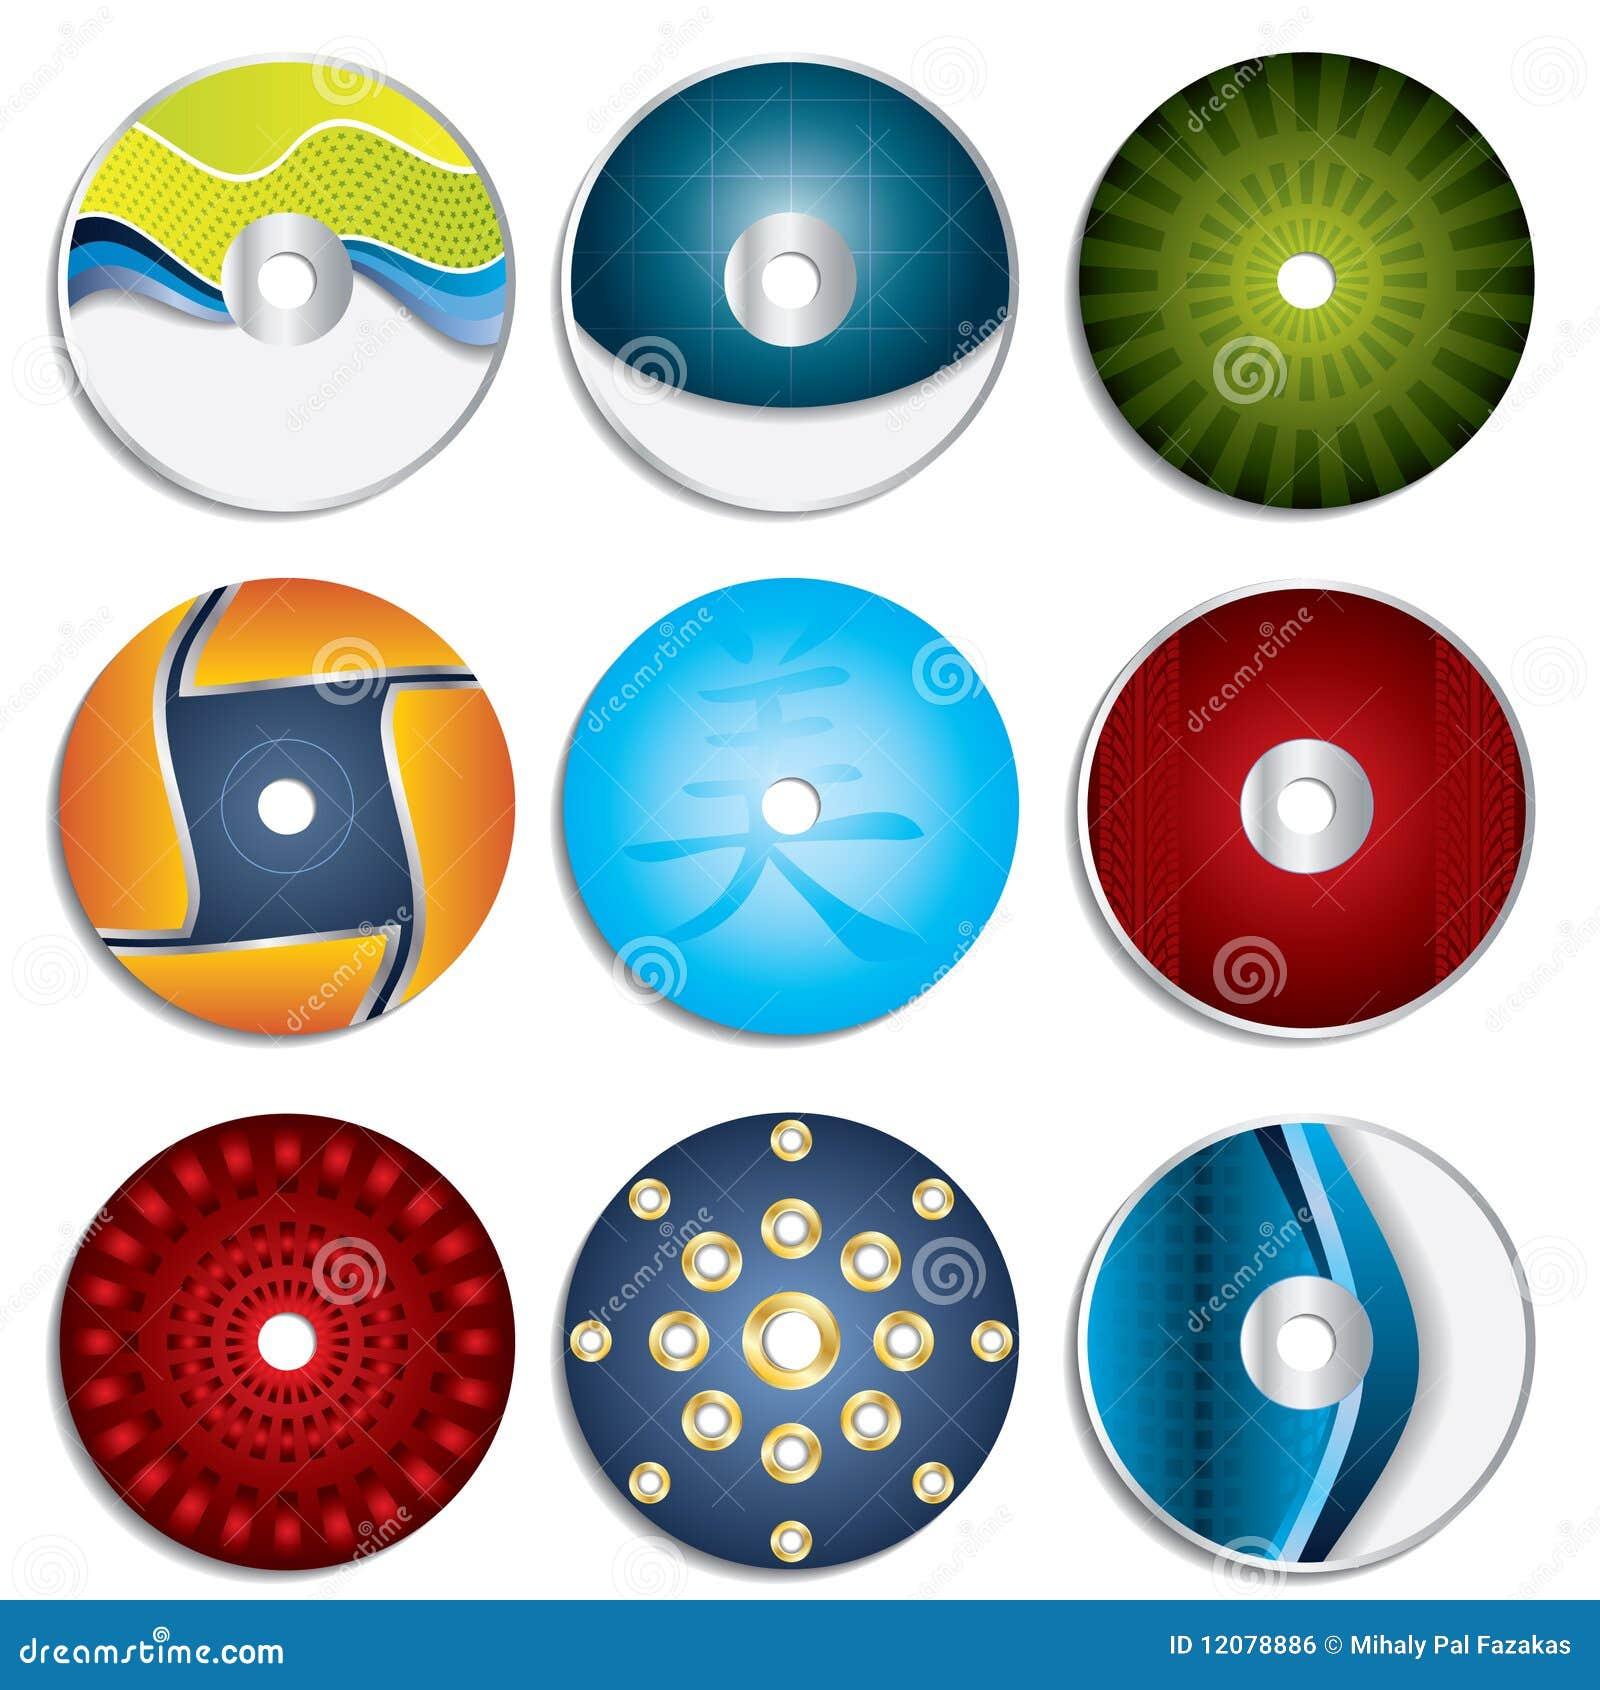 CD & DVD Label Designs 3 Royalty Free Stock Image - Image